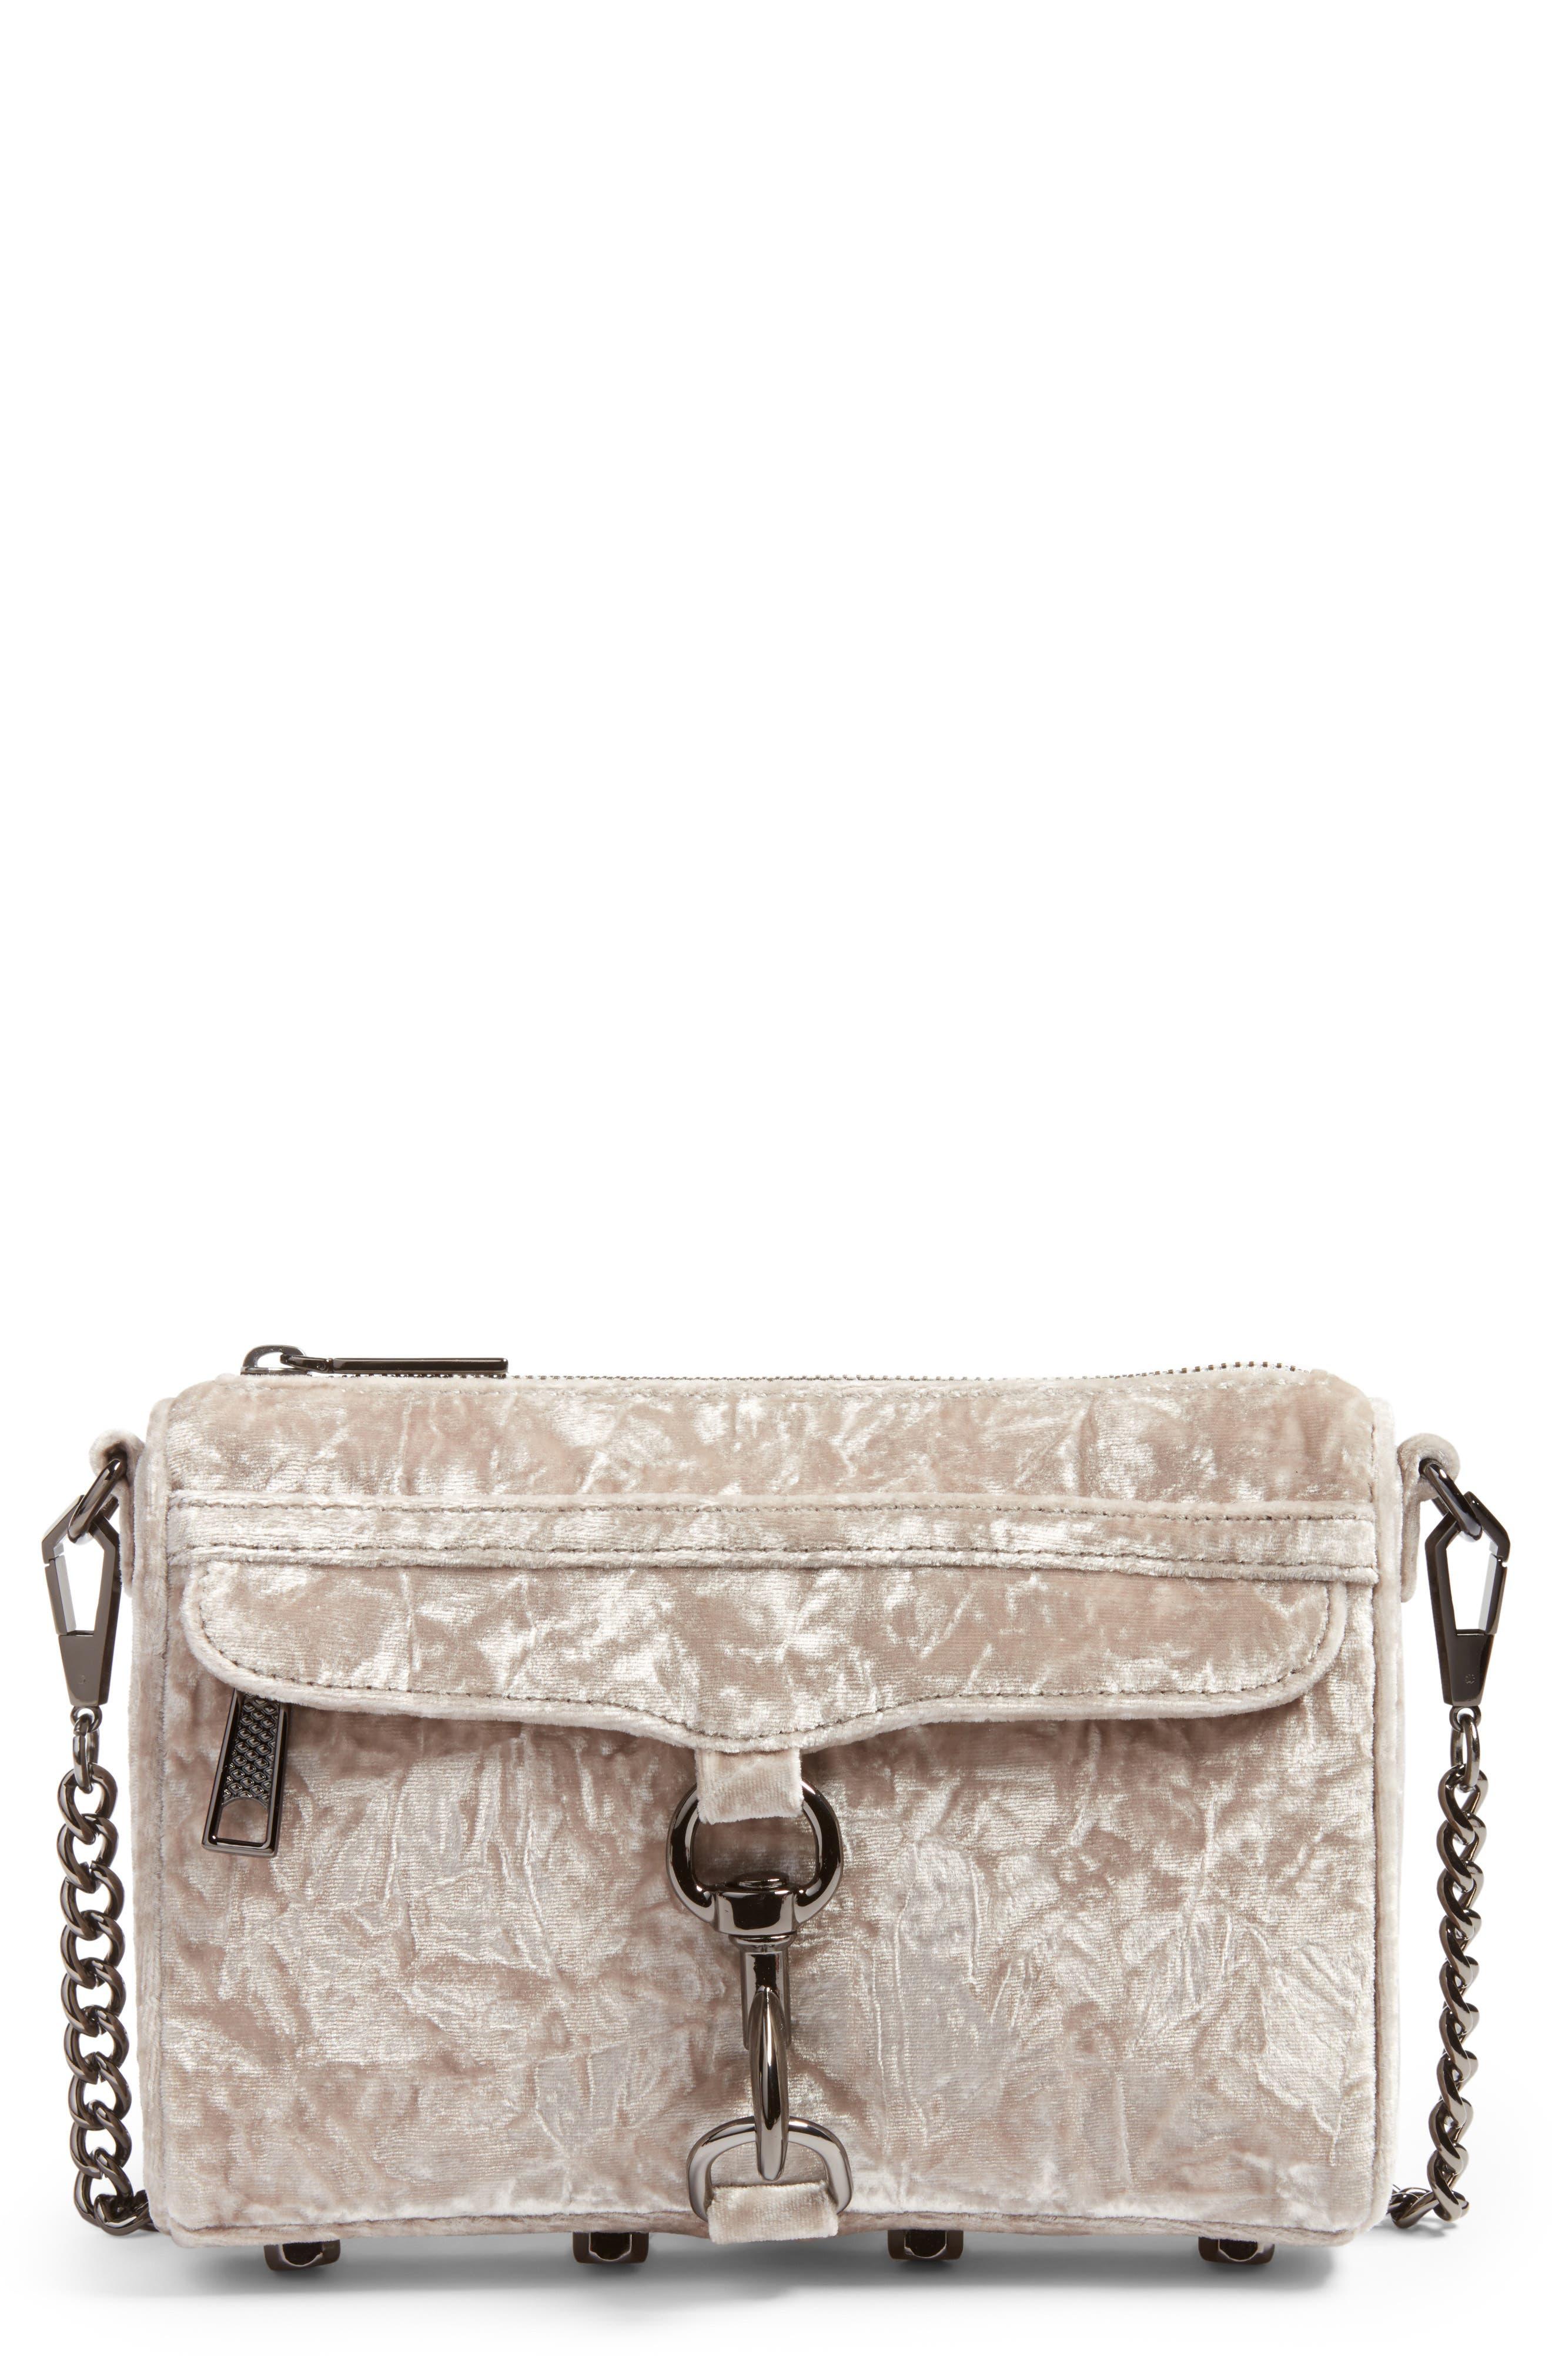 REBECCA MINKOFF Mini MAC Velvet Convertible Crossbody Bag